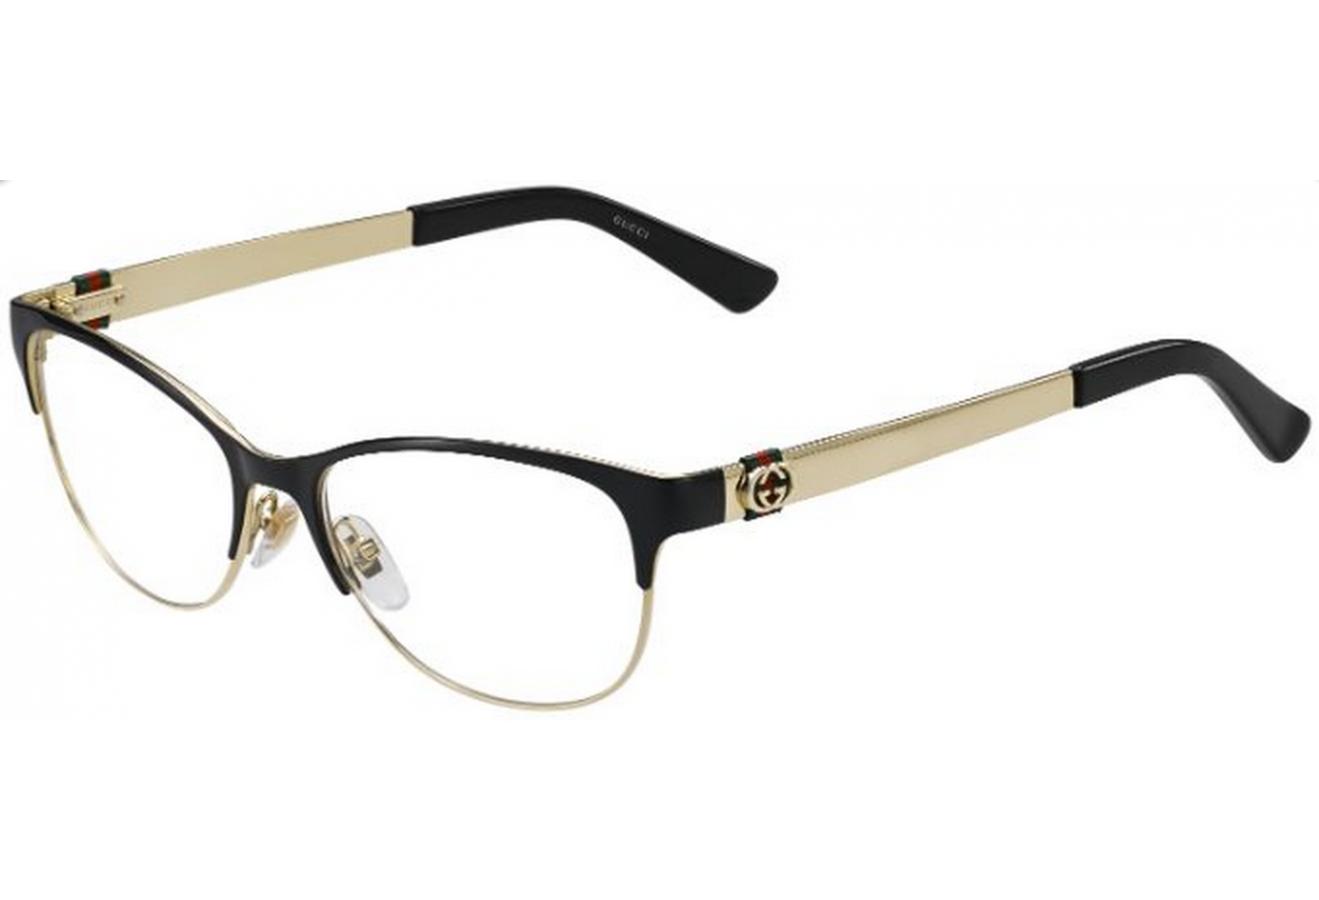 lunettes de vue gucci gg 4281 4z6 53 16. Black Bedroom Furniture Sets. Home Design Ideas